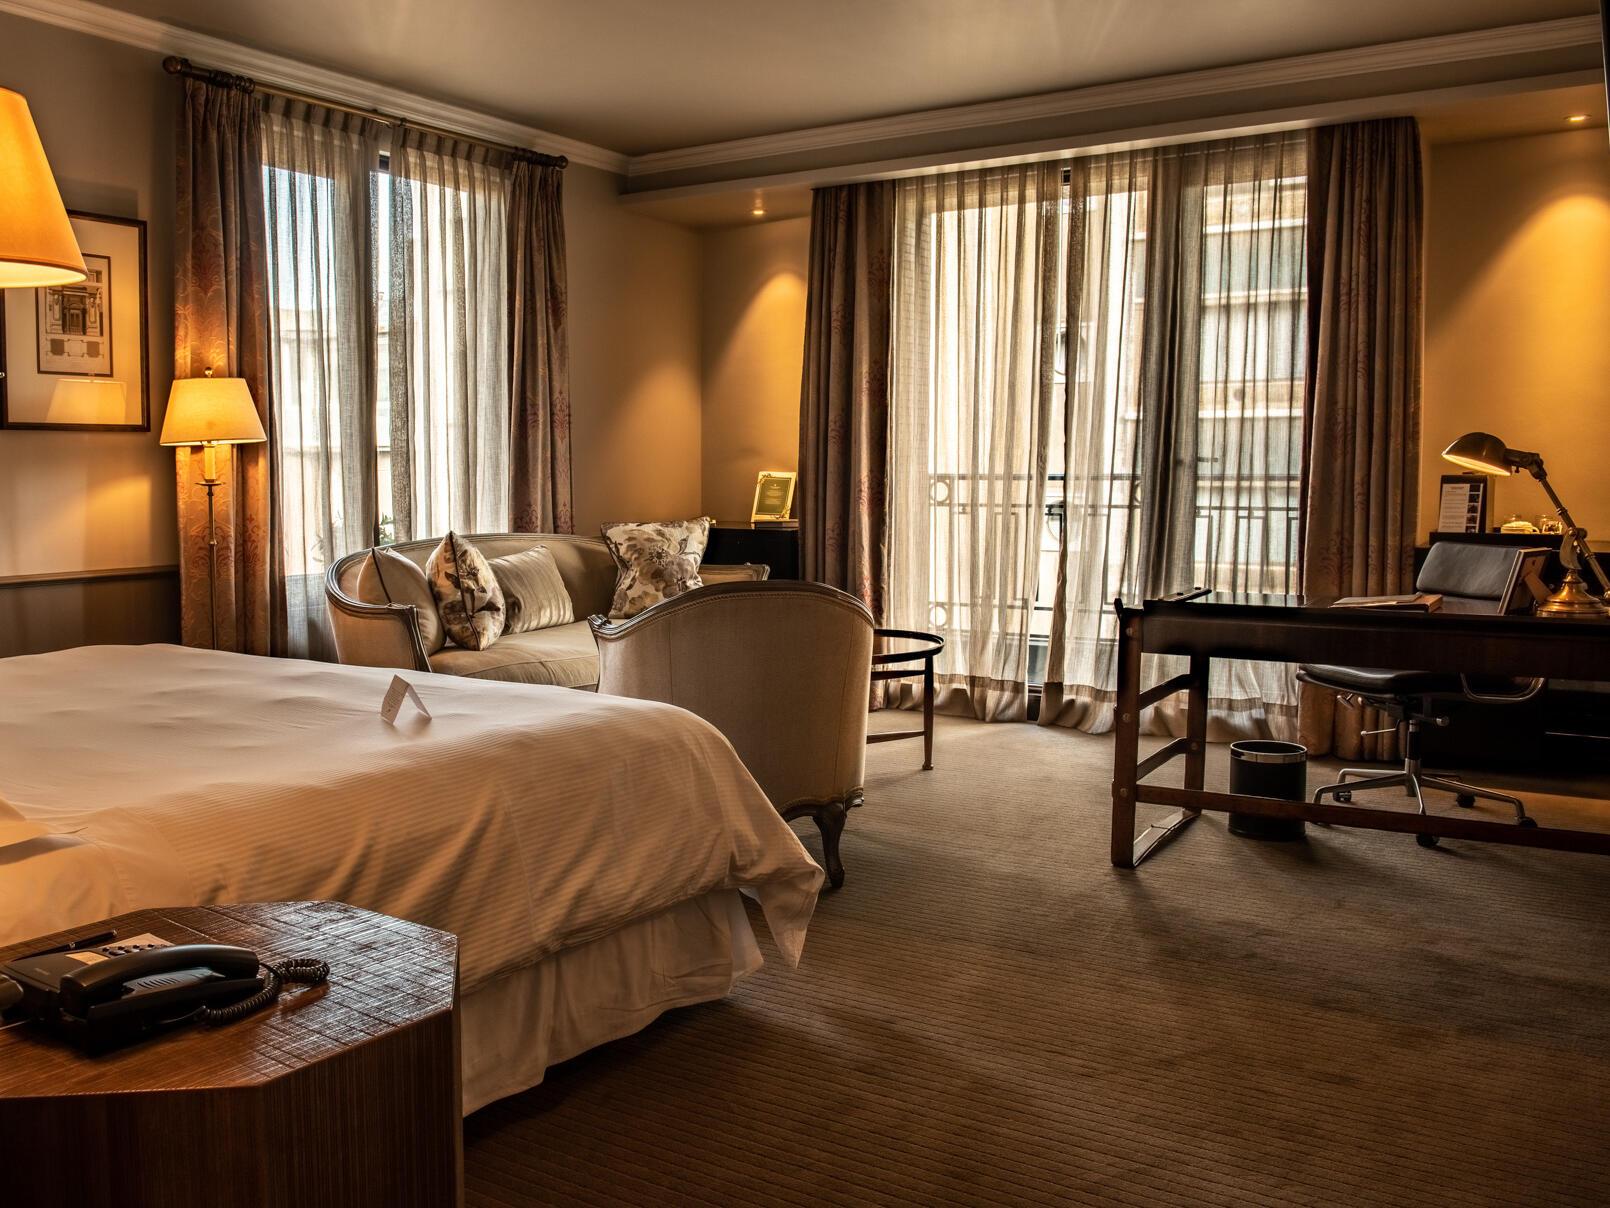 King Room Hotel Santiago